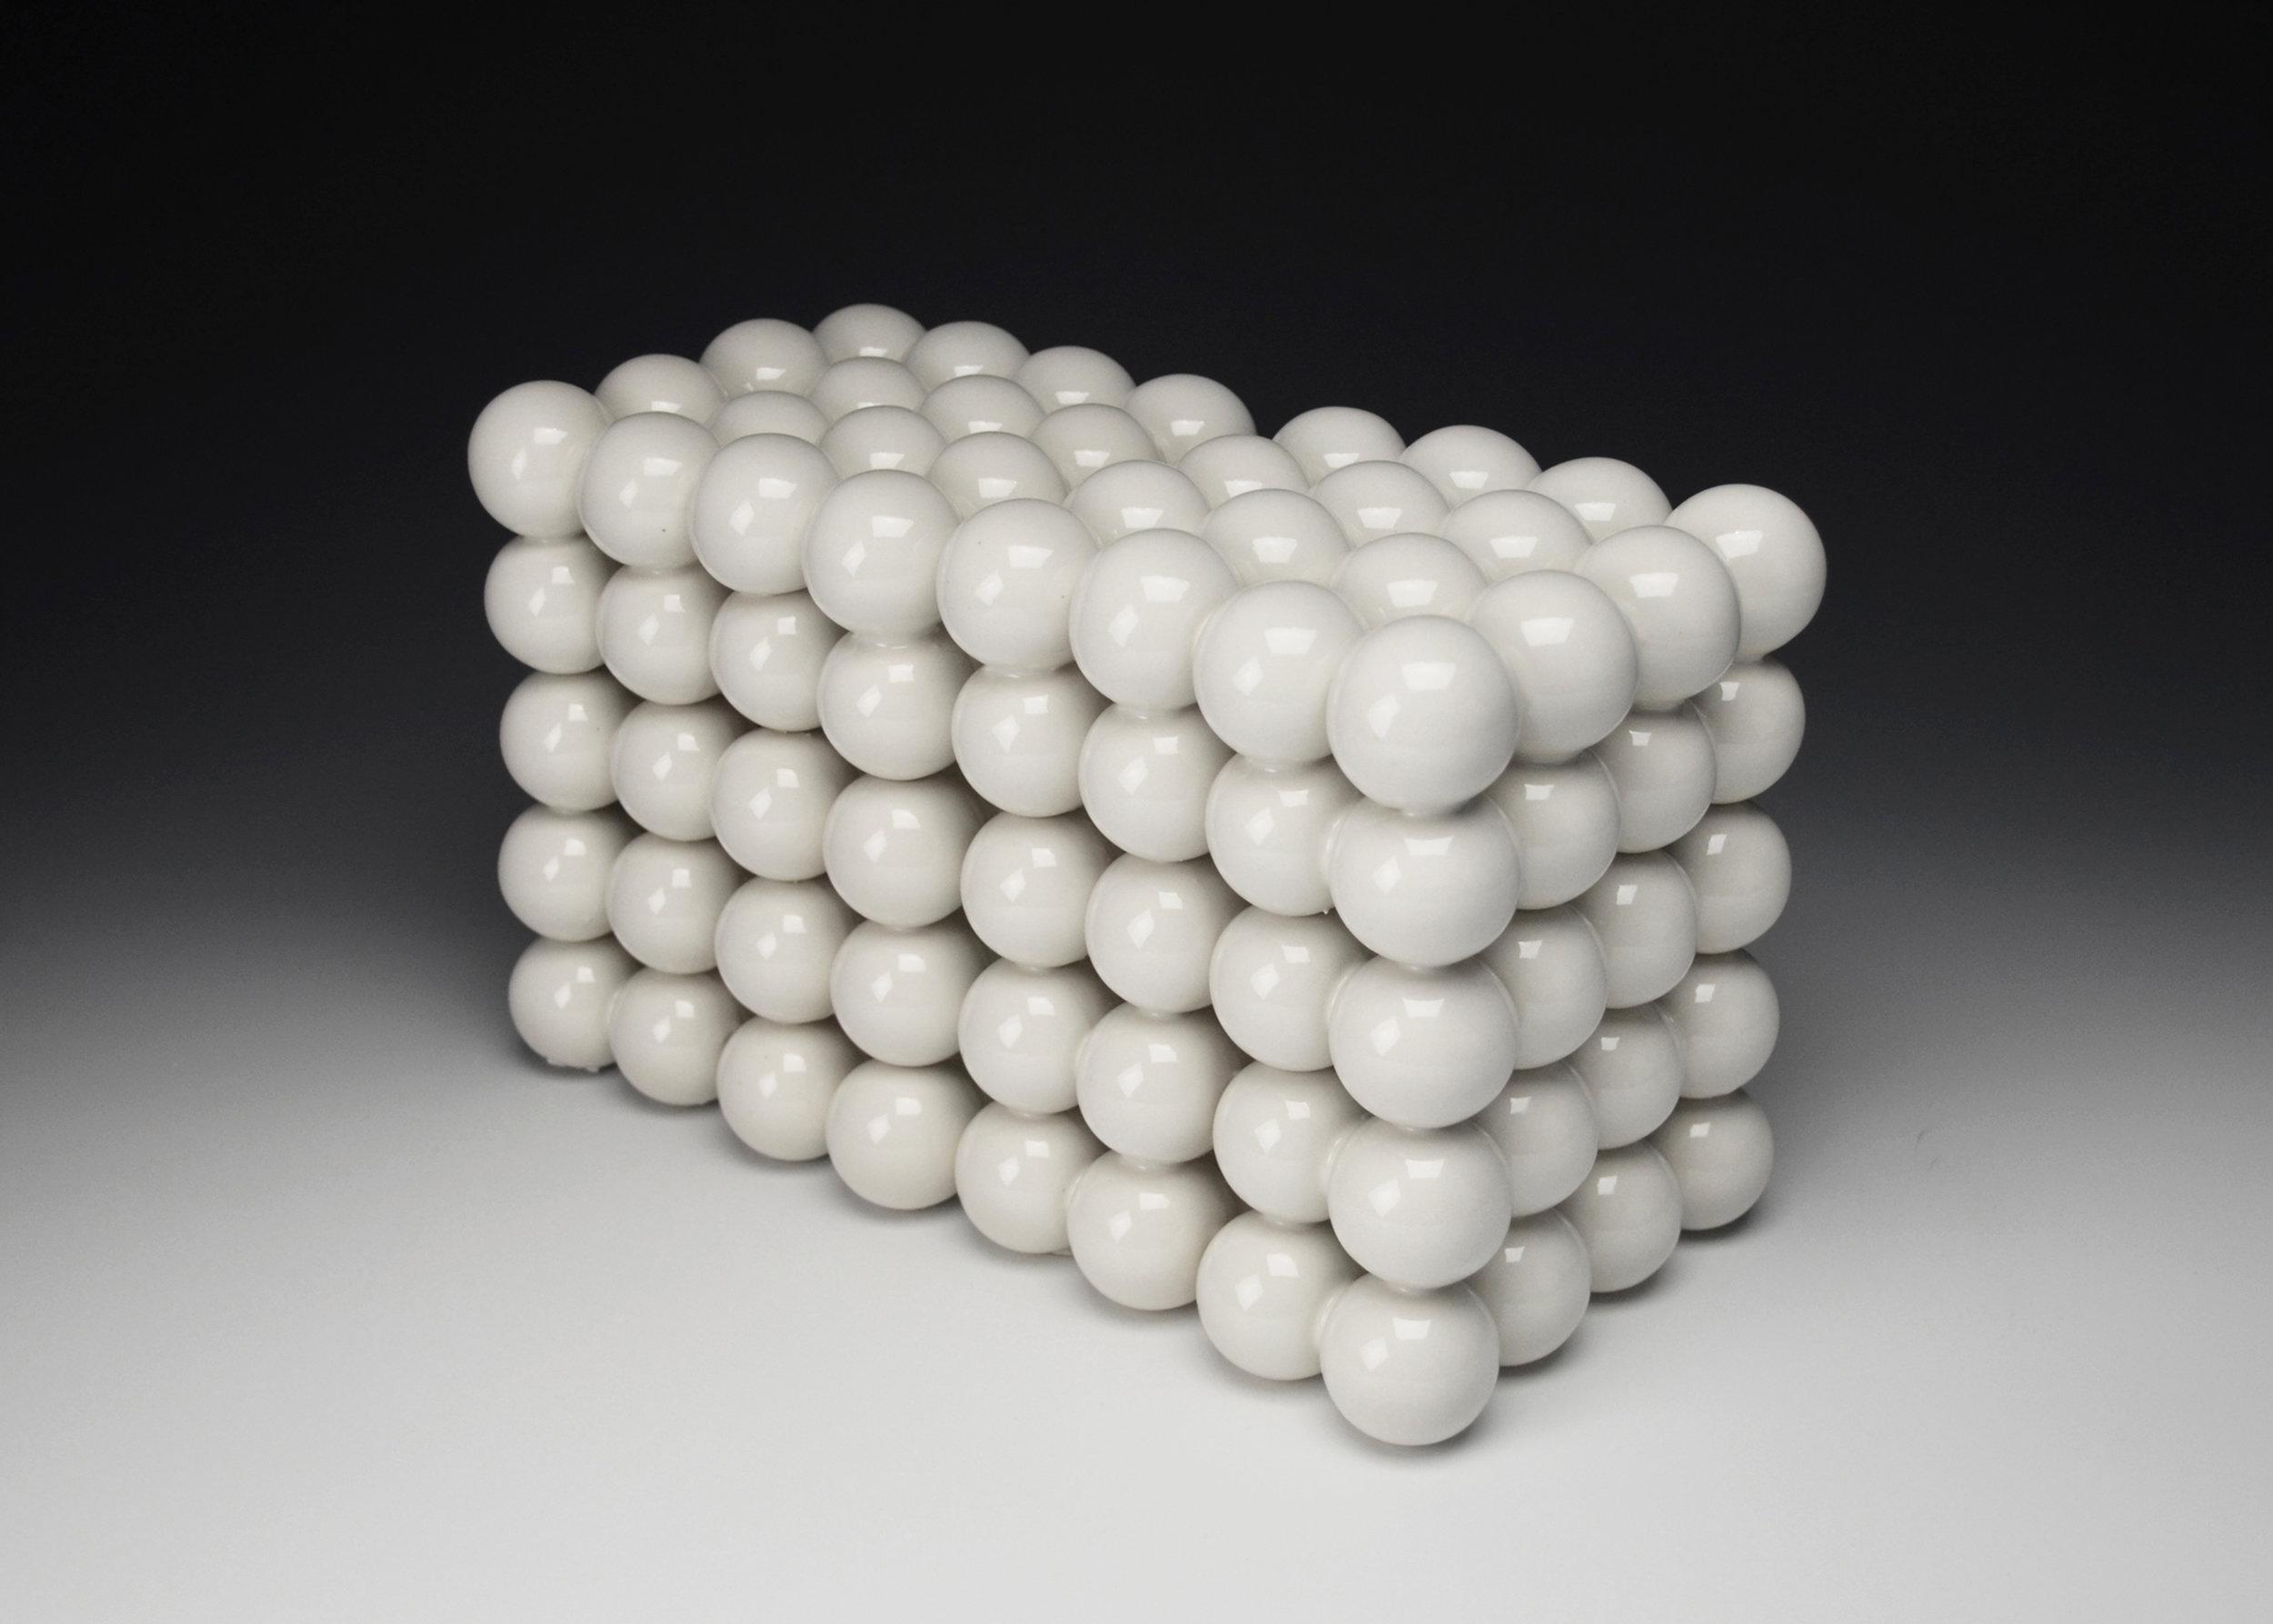 Ionic Series: Construction X  |  7 x 11 x 5.5 inches  |  Porcelain, Glaze  |  2017